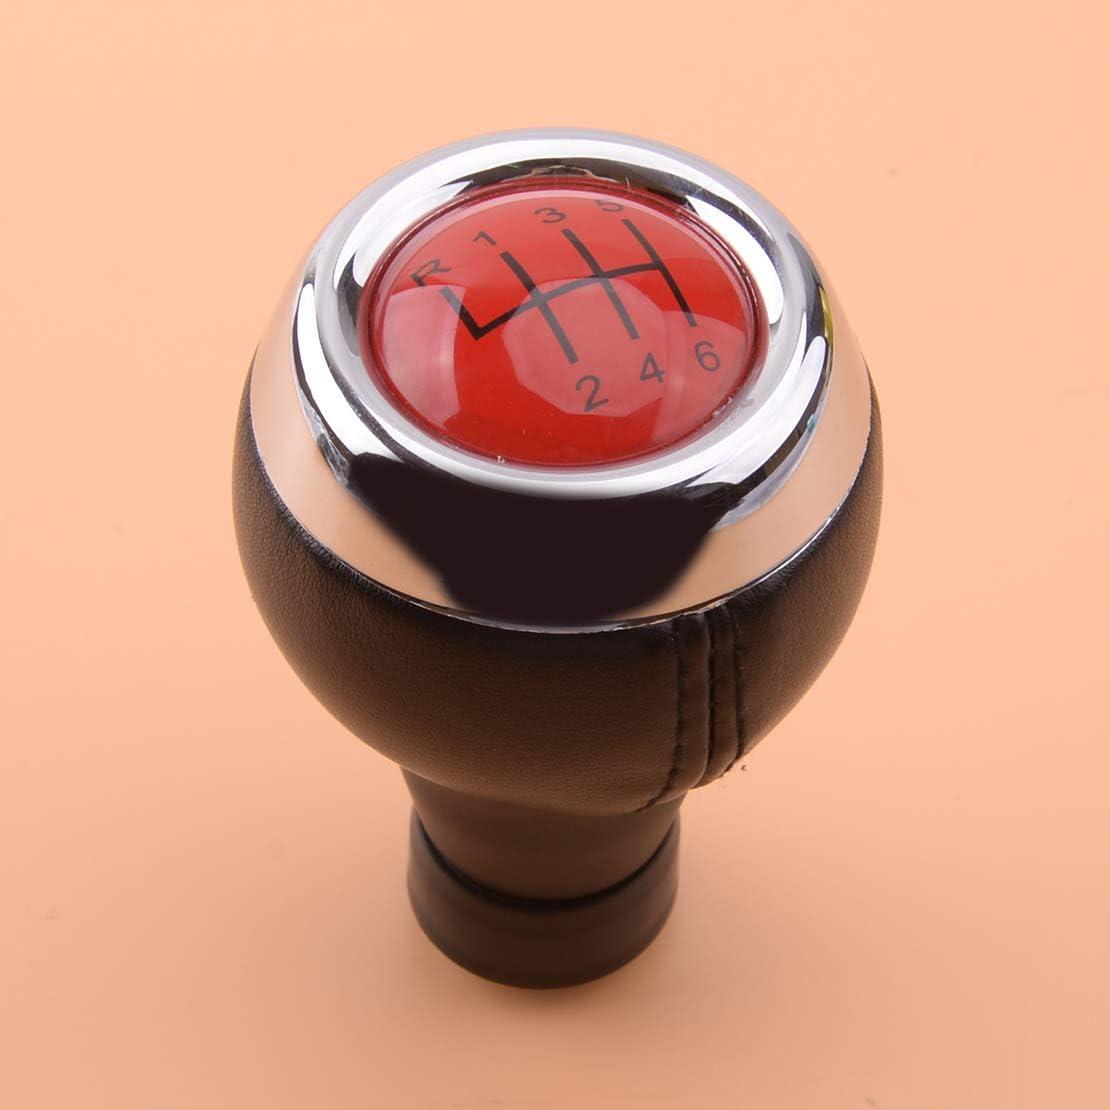 beler Red Top Manual 6 Speed Gear Shift Knob Shifter Head